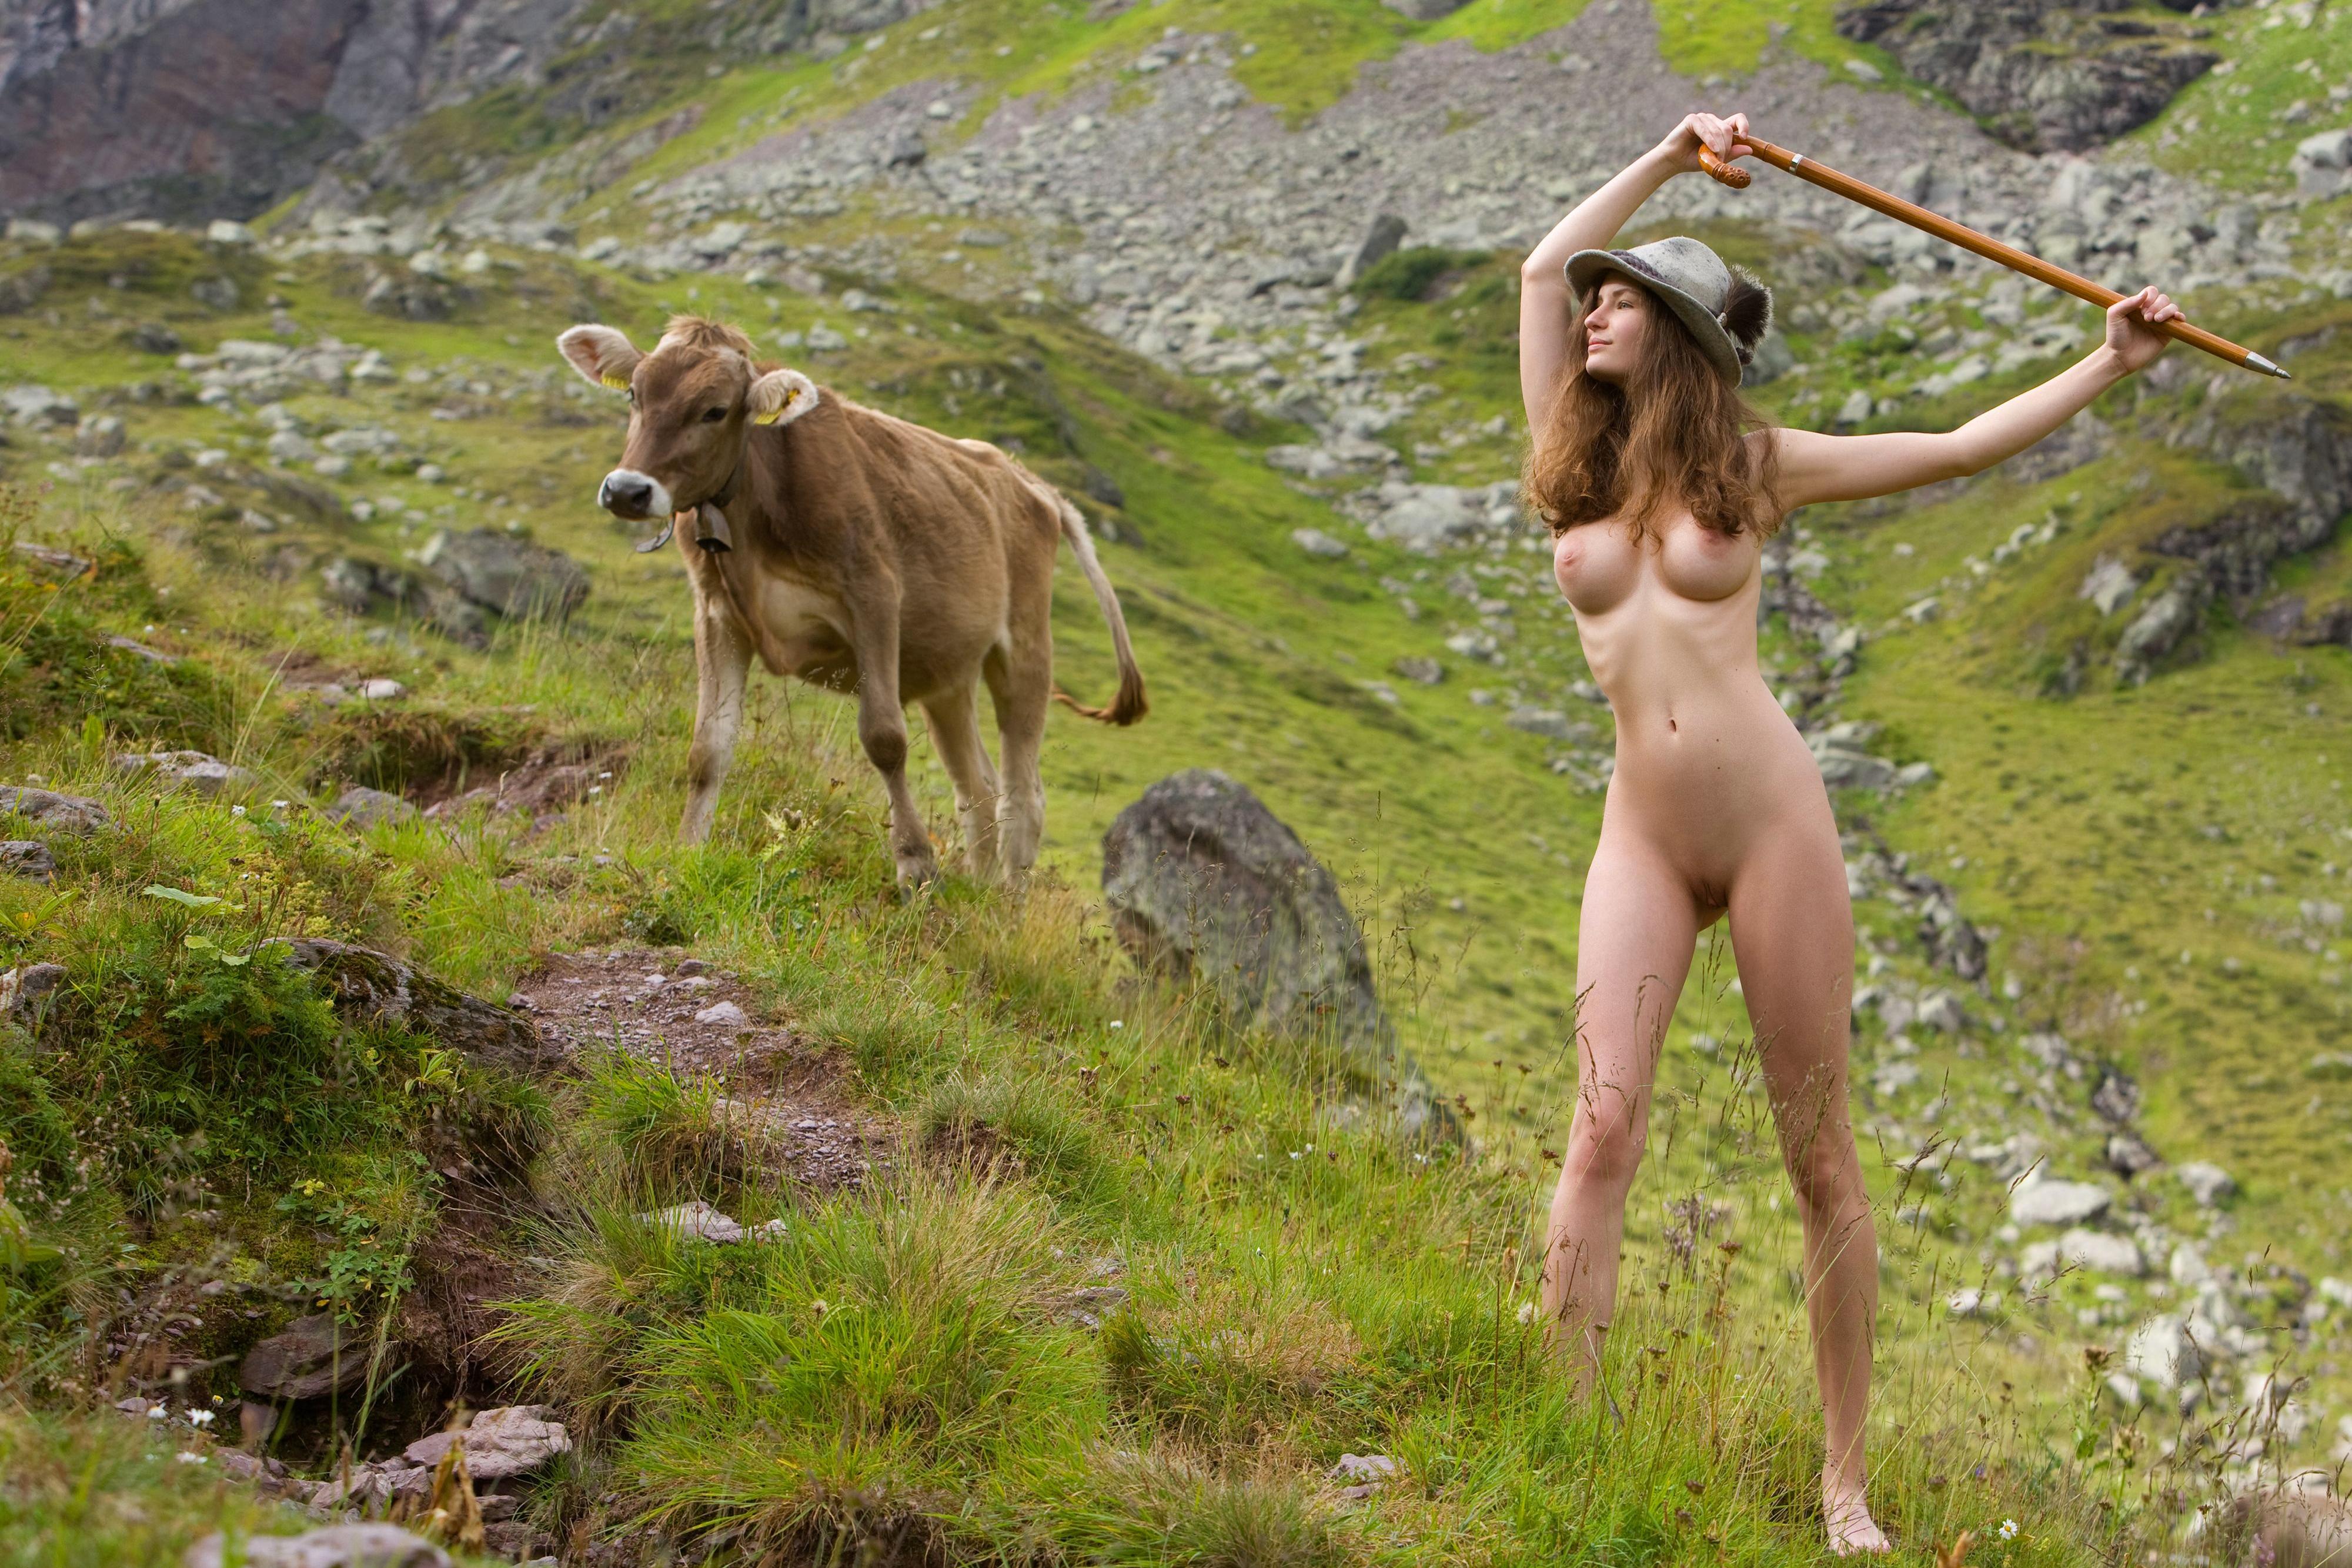 Cow nude pic fucks pics